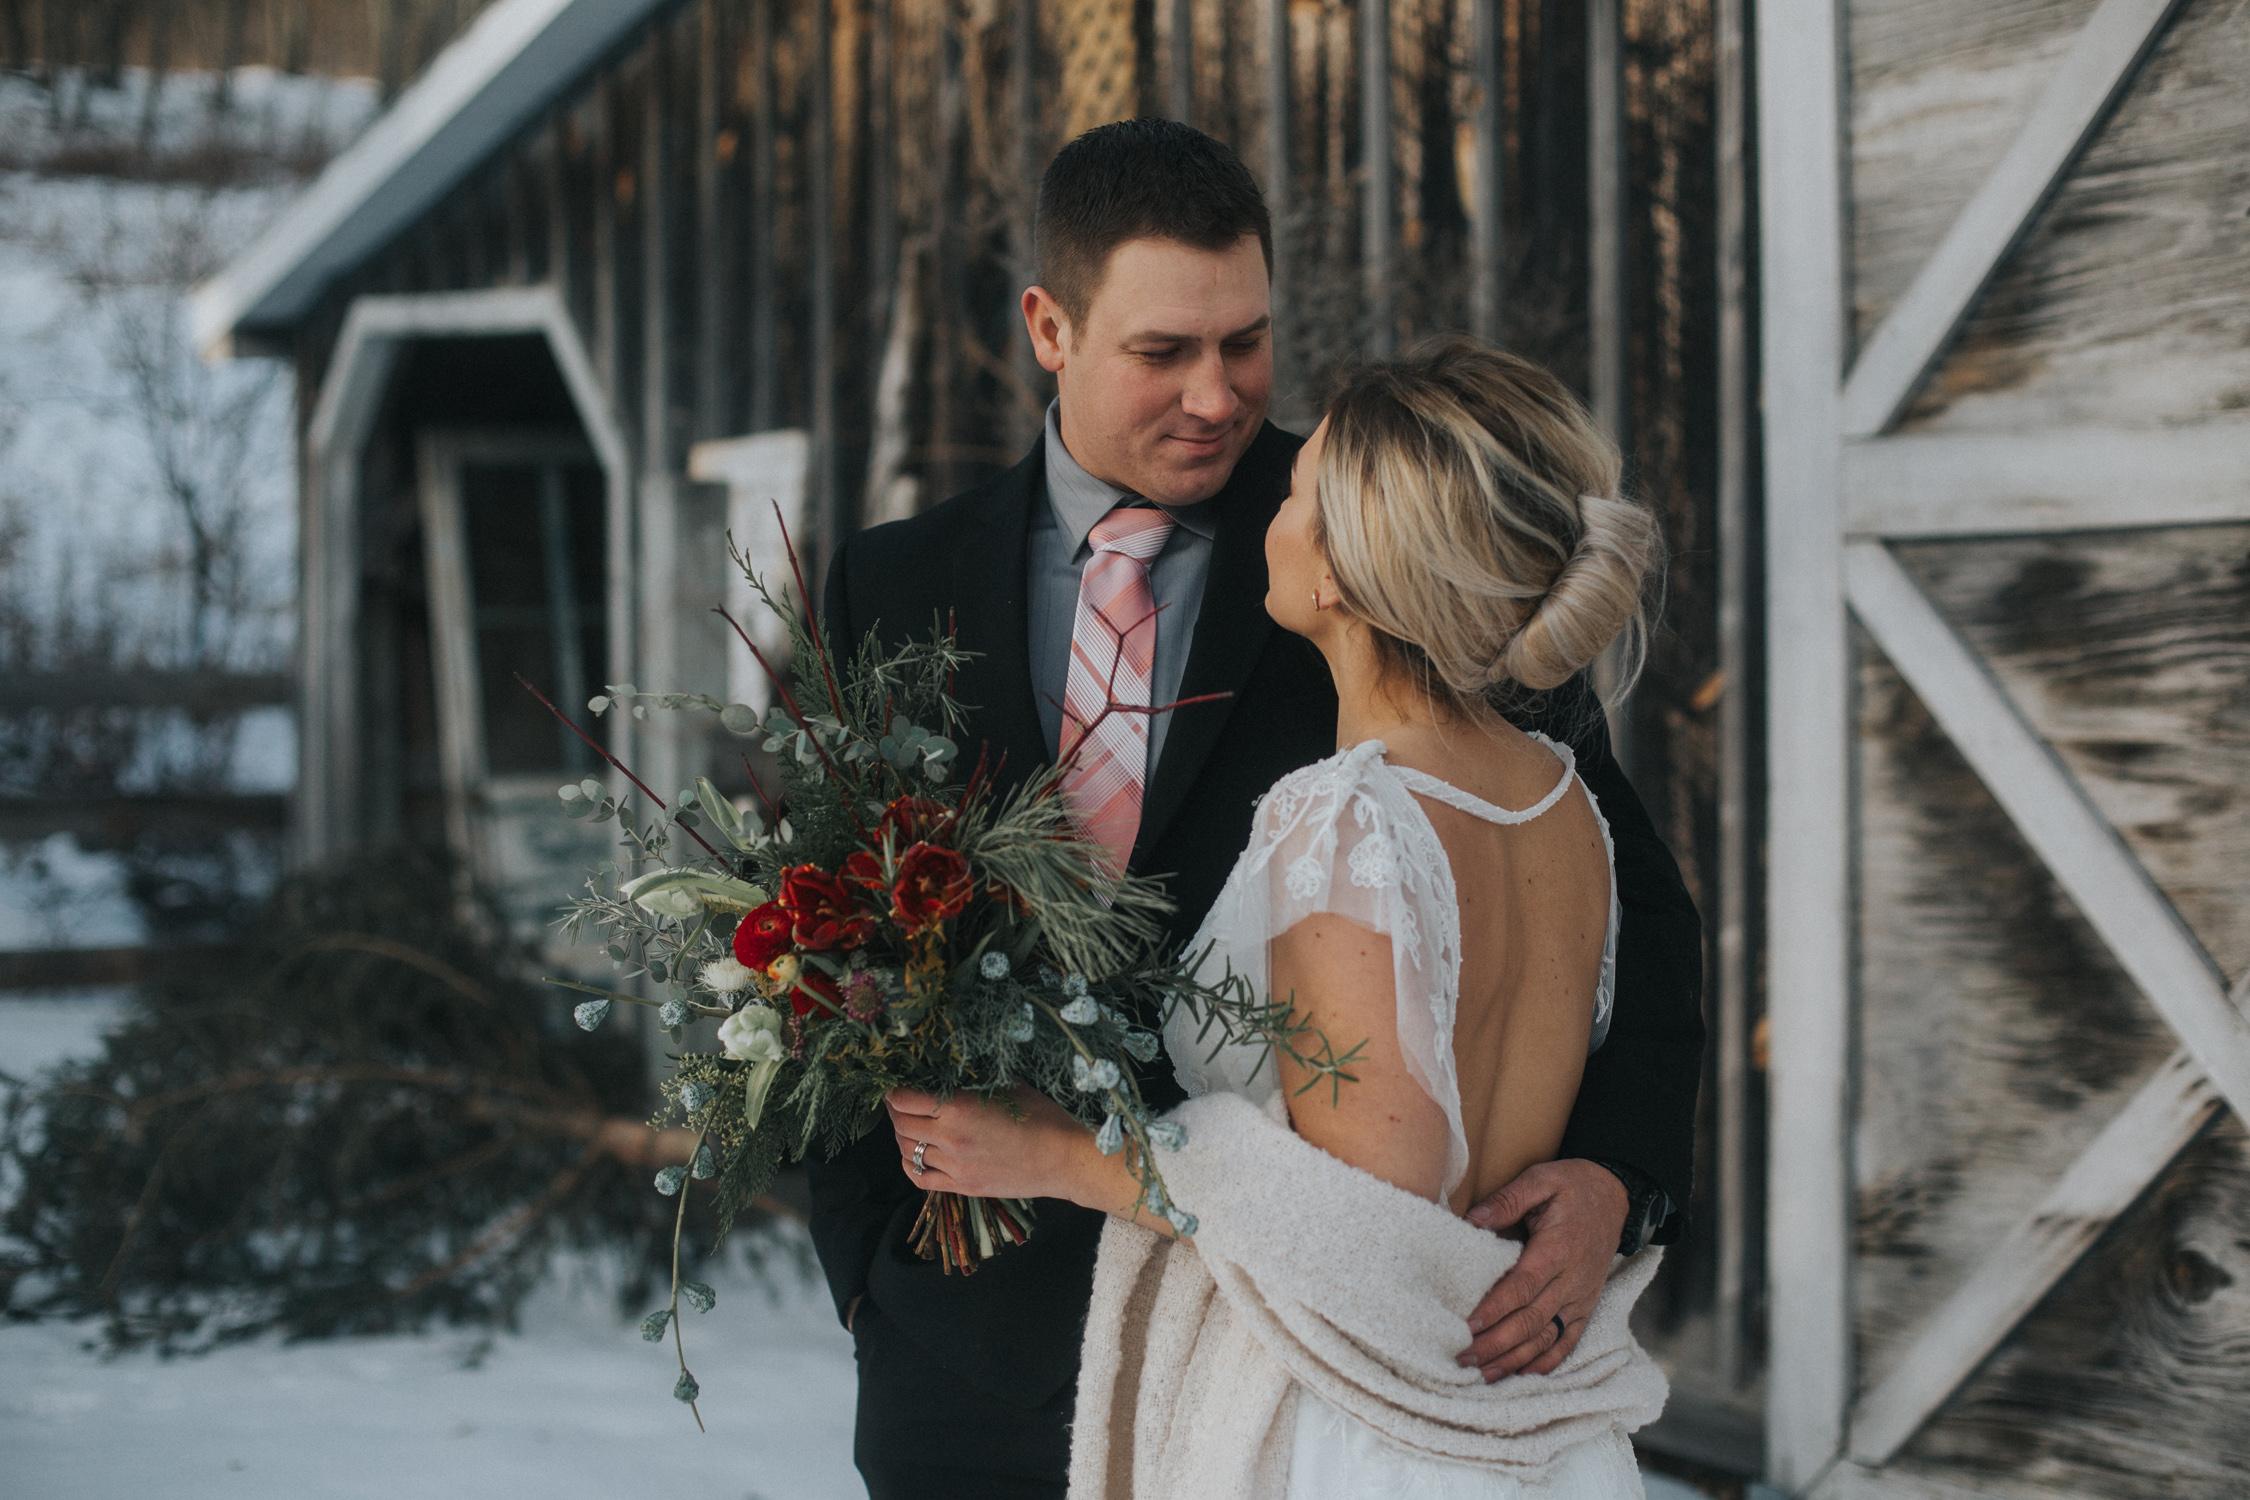 mnd_farm_winter_wedding_007.jpg